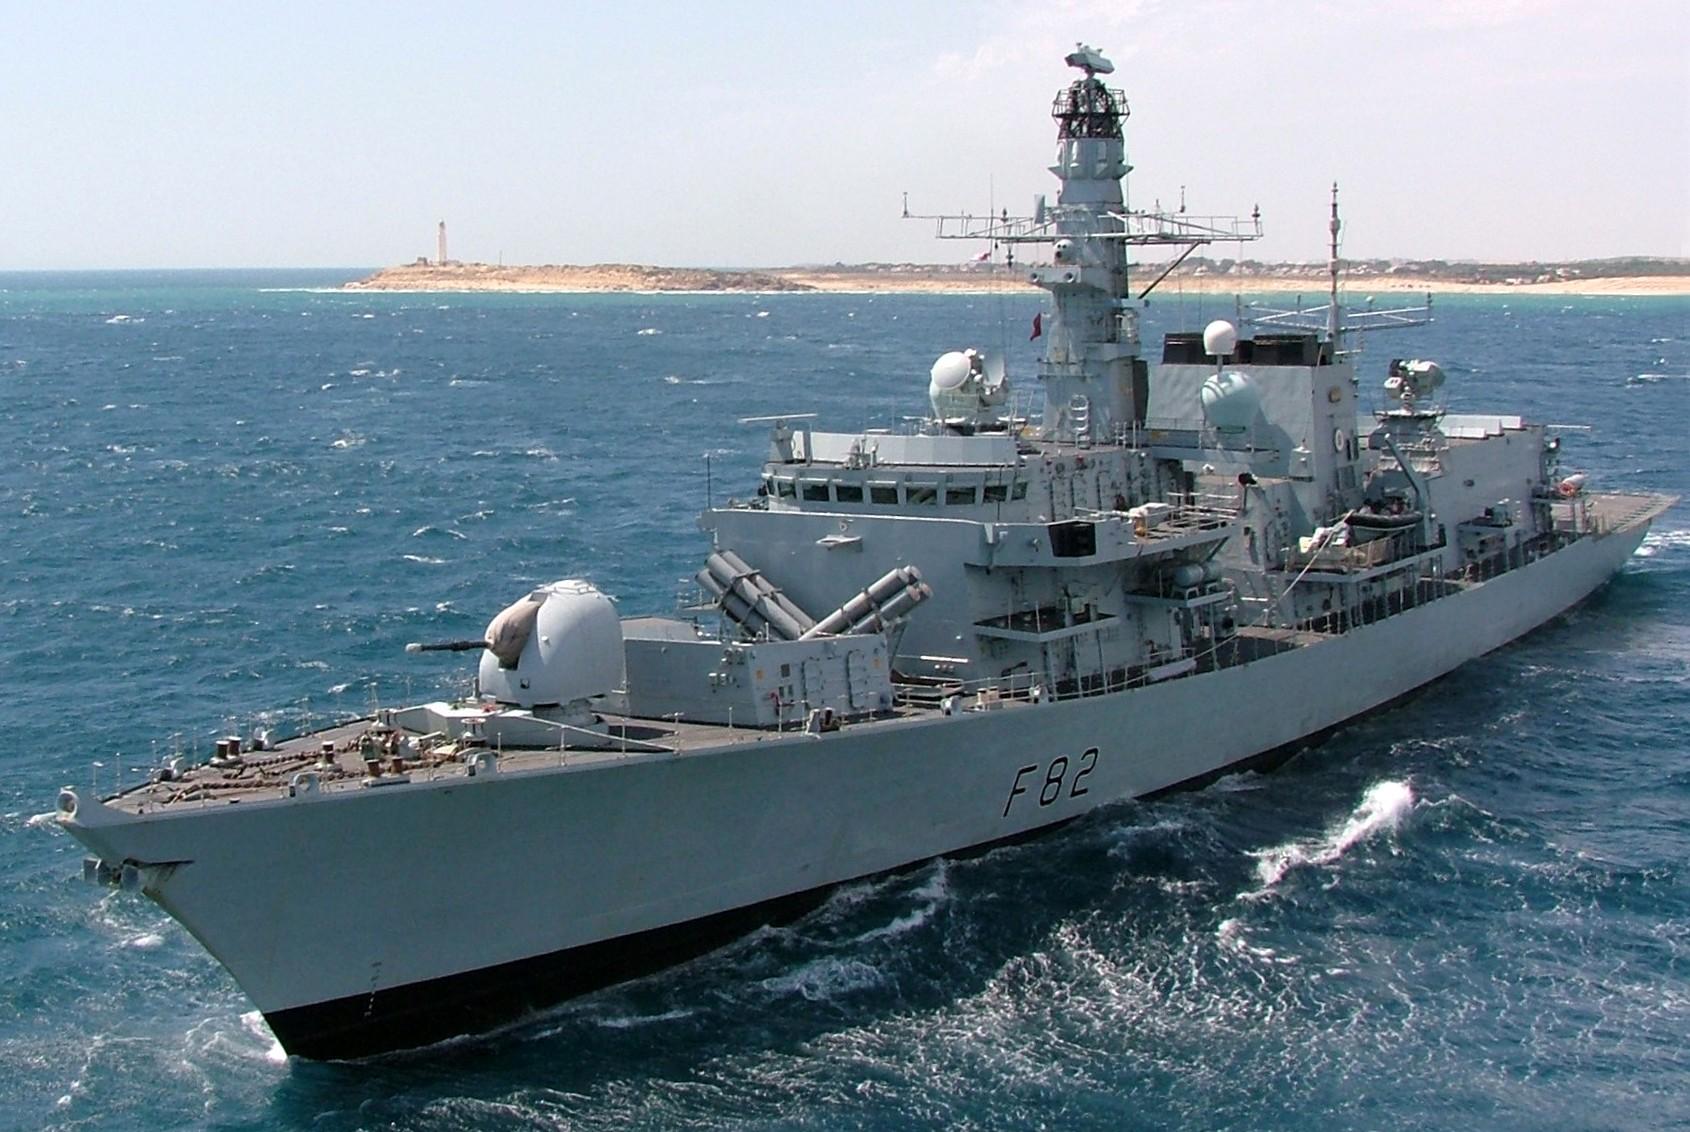 hms somerset f 82 type 23 duke class guided missile frigate royal navy. Black Bedroom Furniture Sets. Home Design Ideas